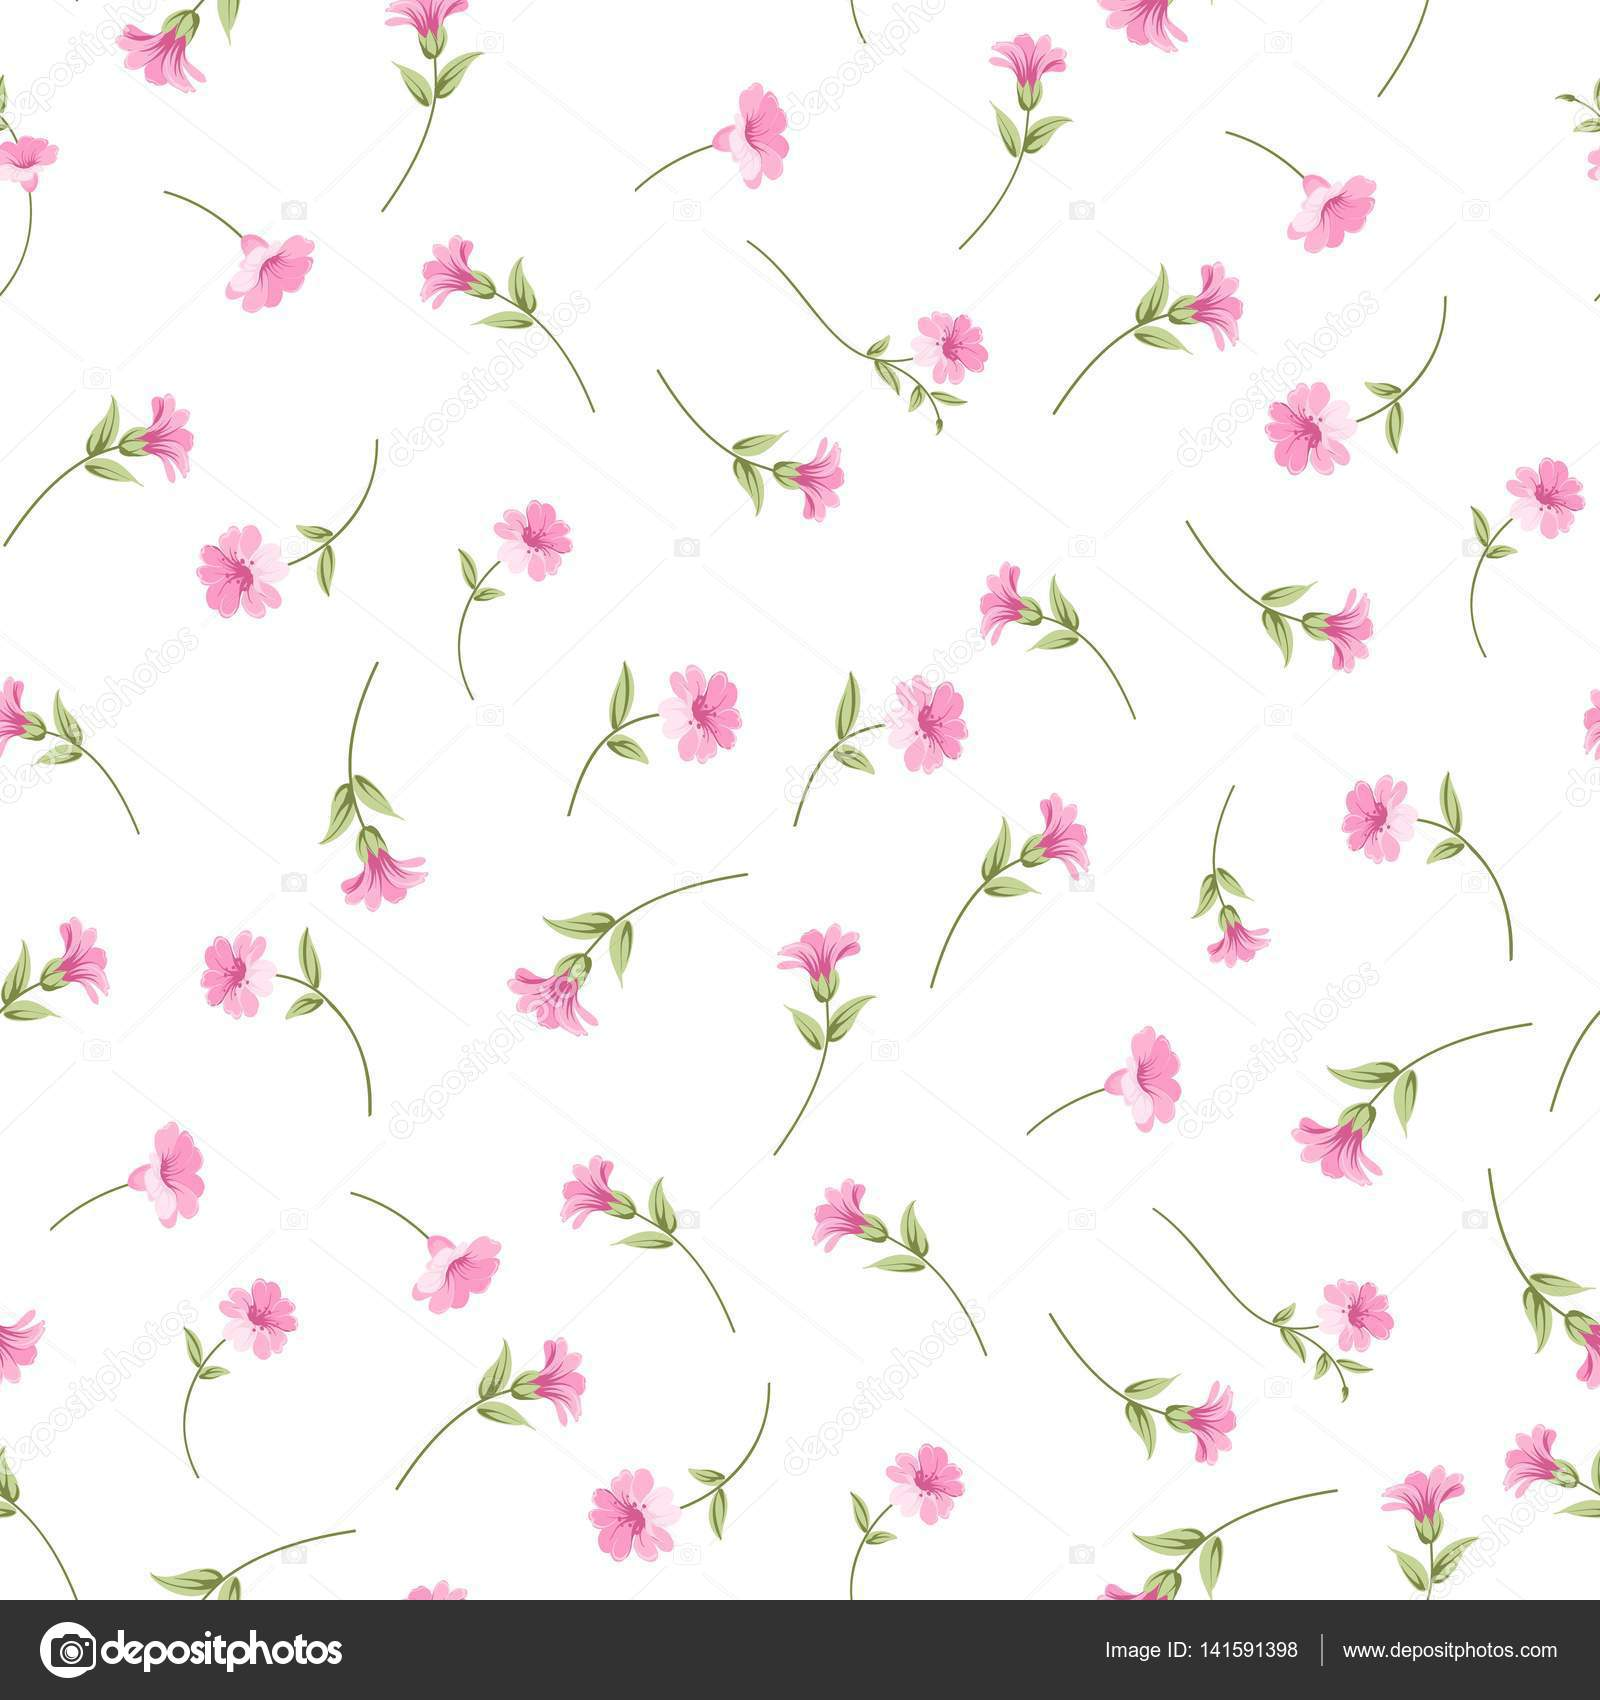 The Elegant Flowers Fabric Stock Vector C Kotkoa 141591398